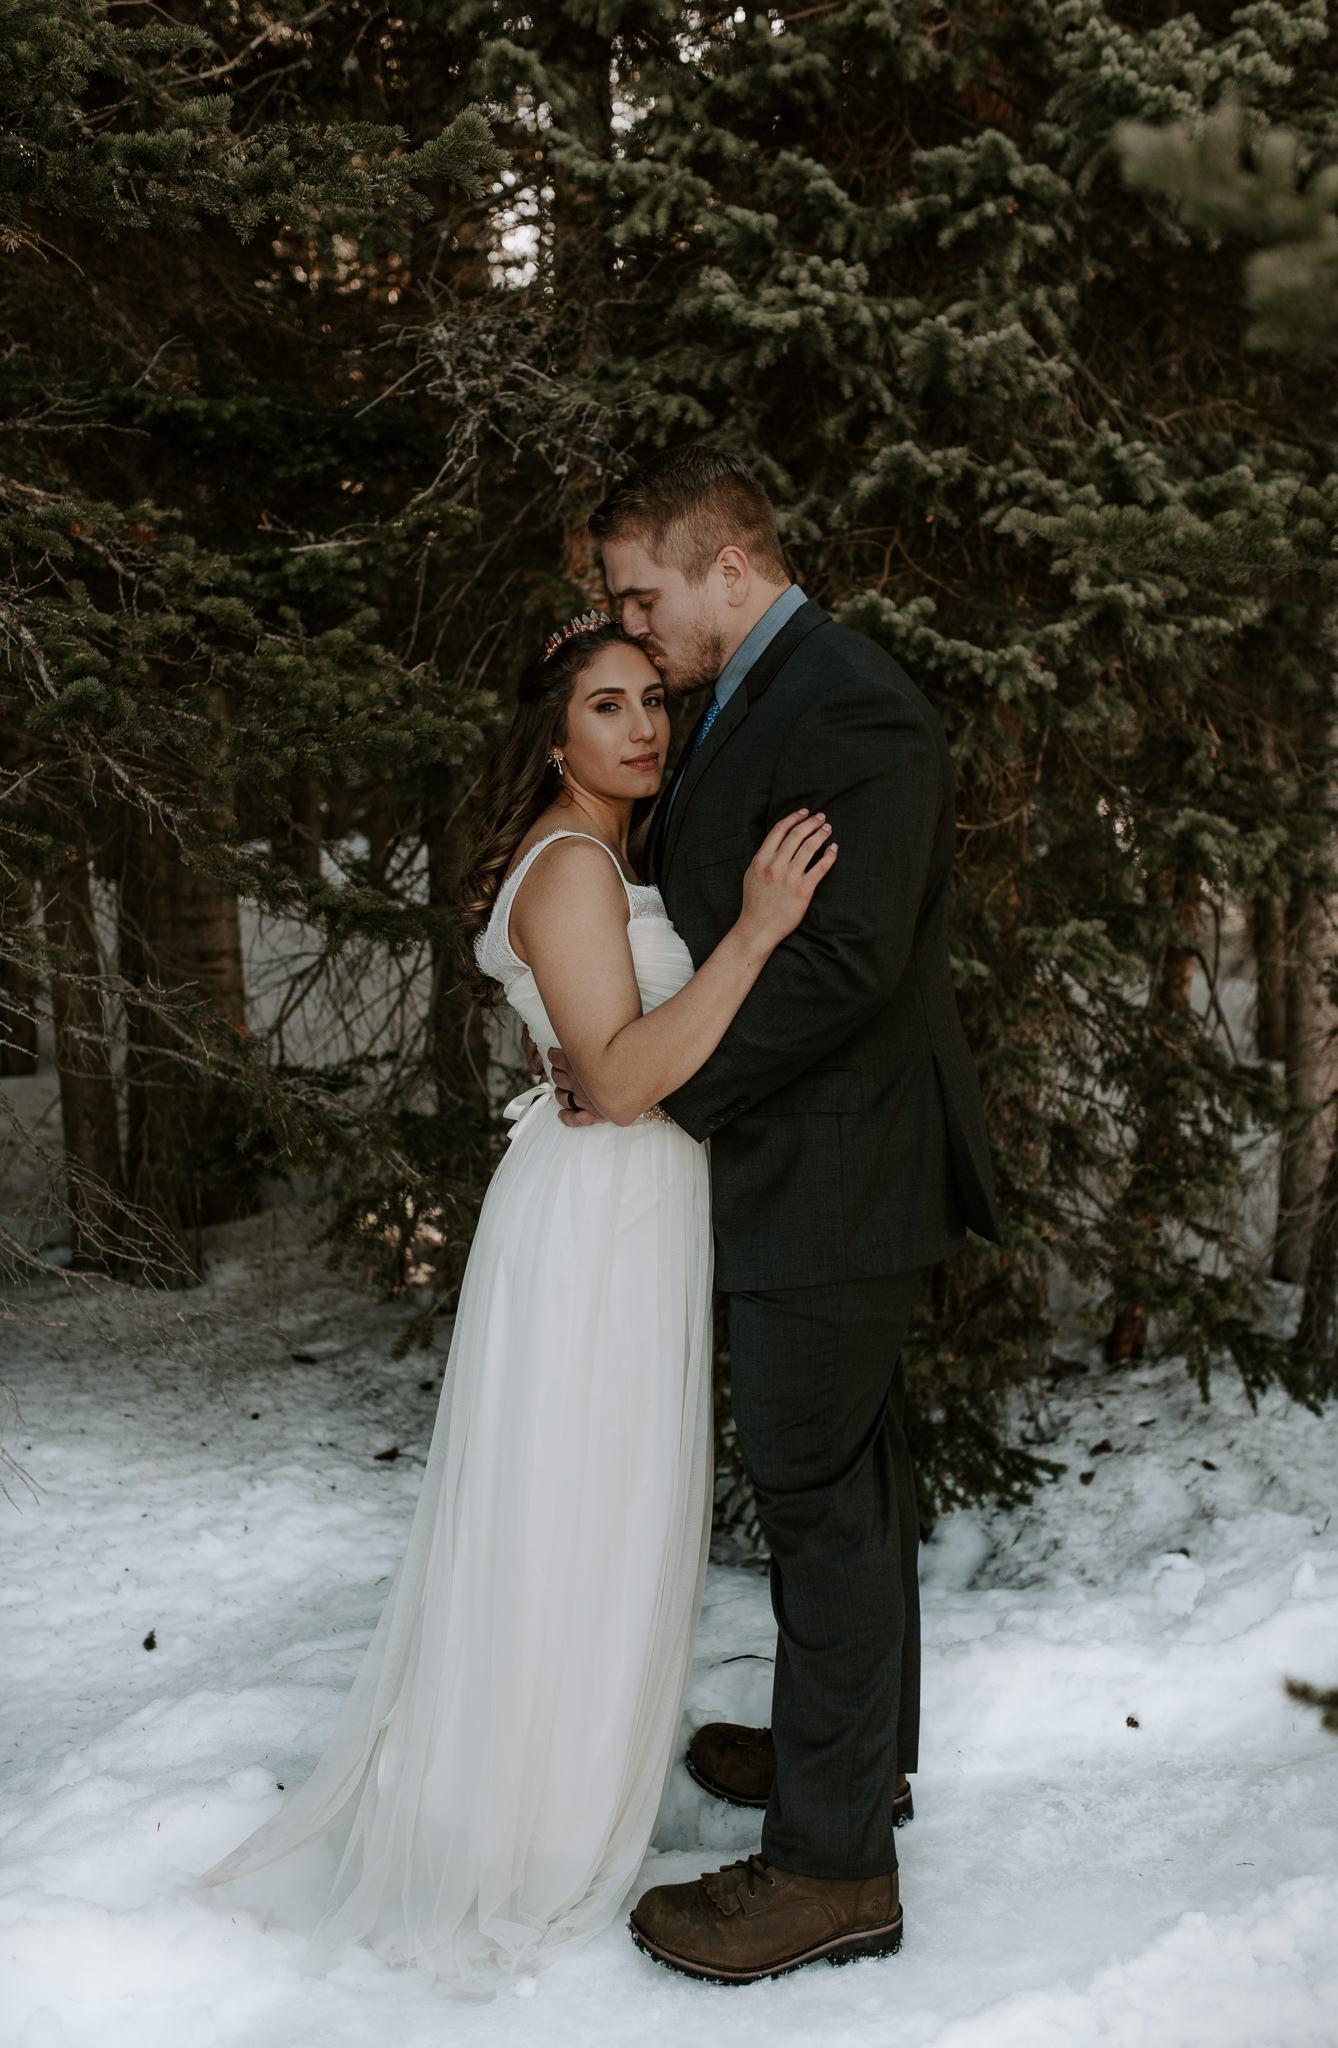 Hiking adventure elopement photographer in Colorado